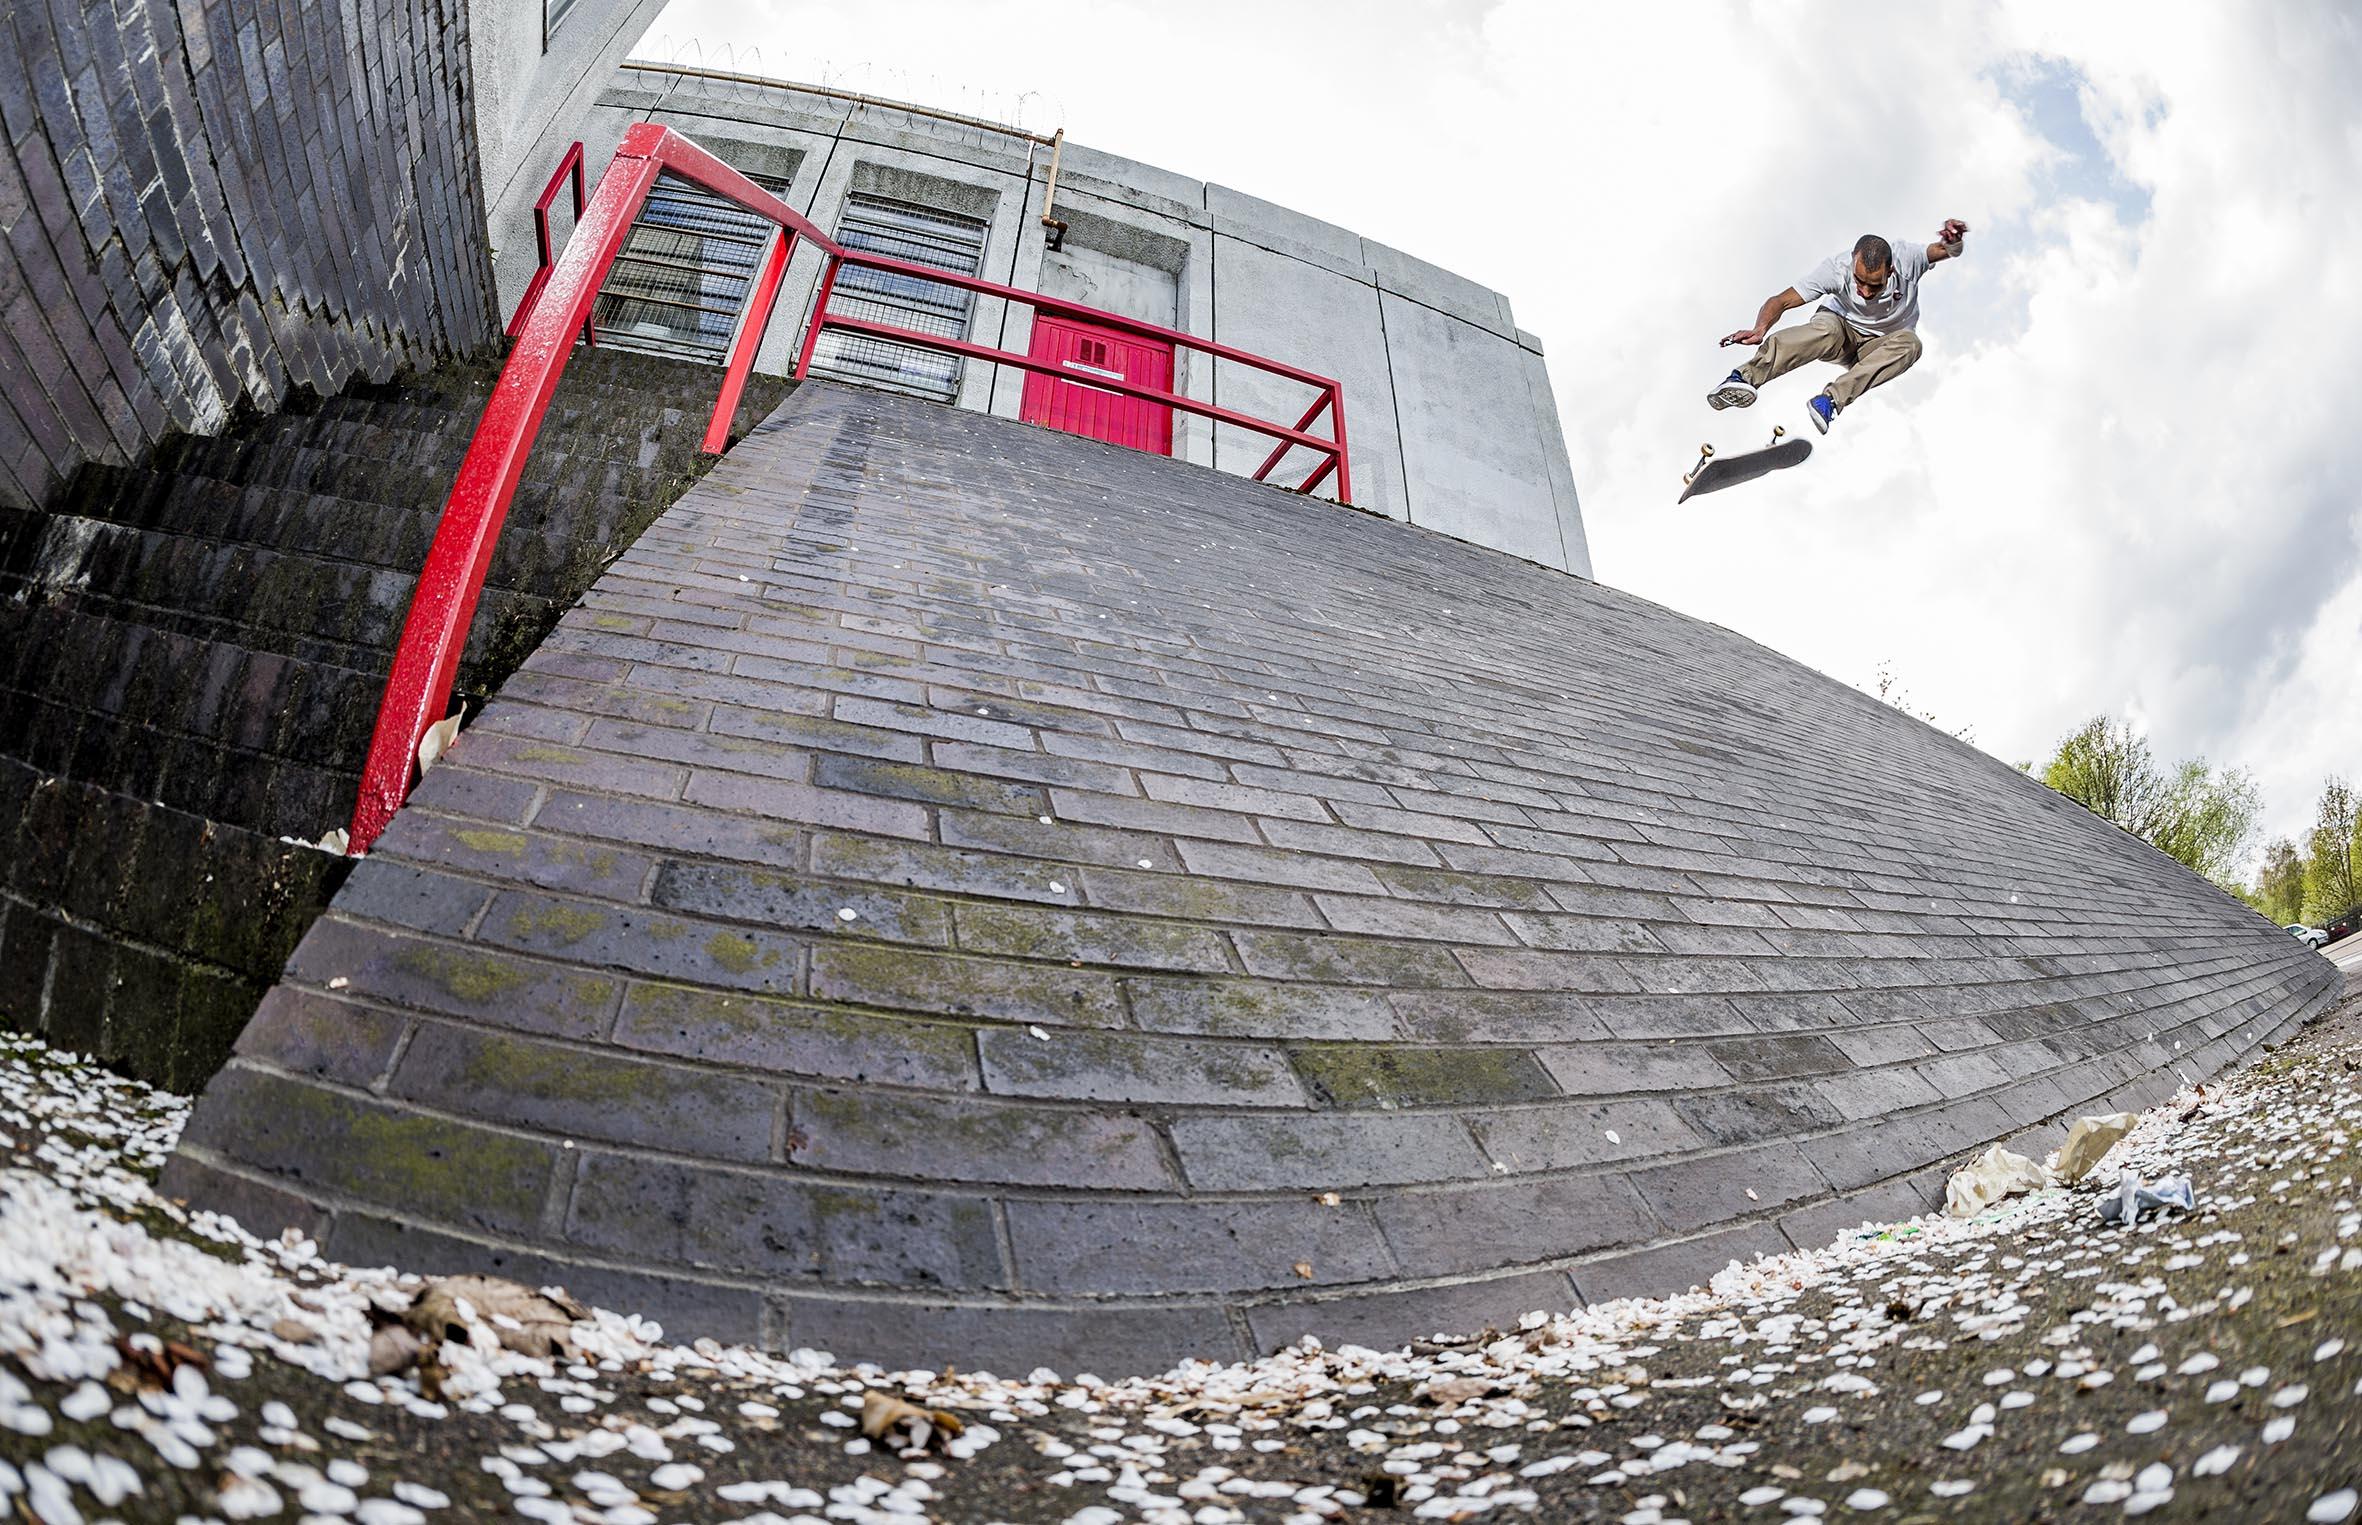 Jerome Campbell - backside kickflip